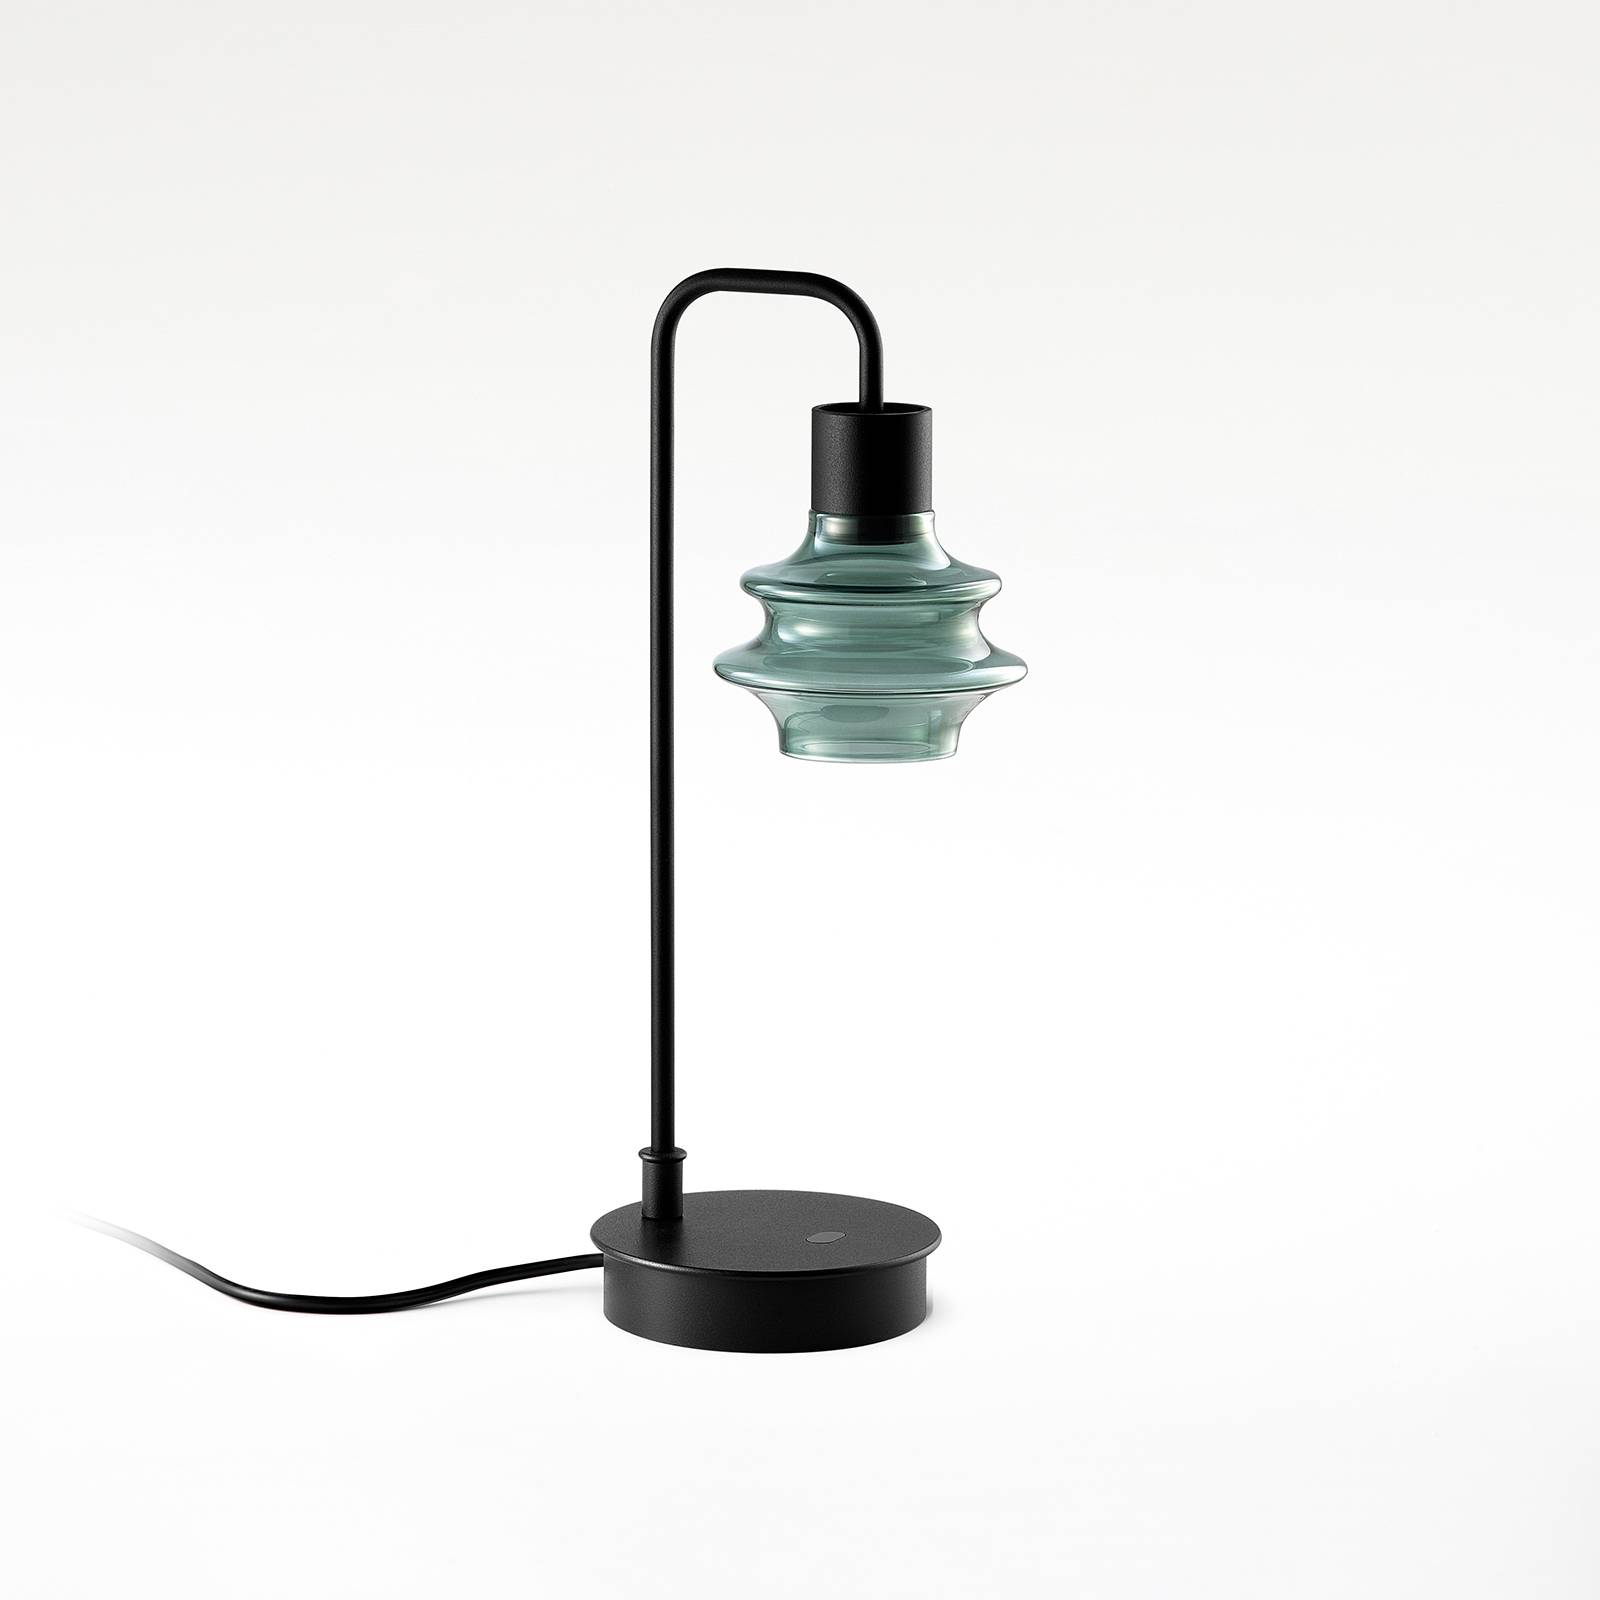 Bover Drop M/36 LED-pöytälamppu vihreä